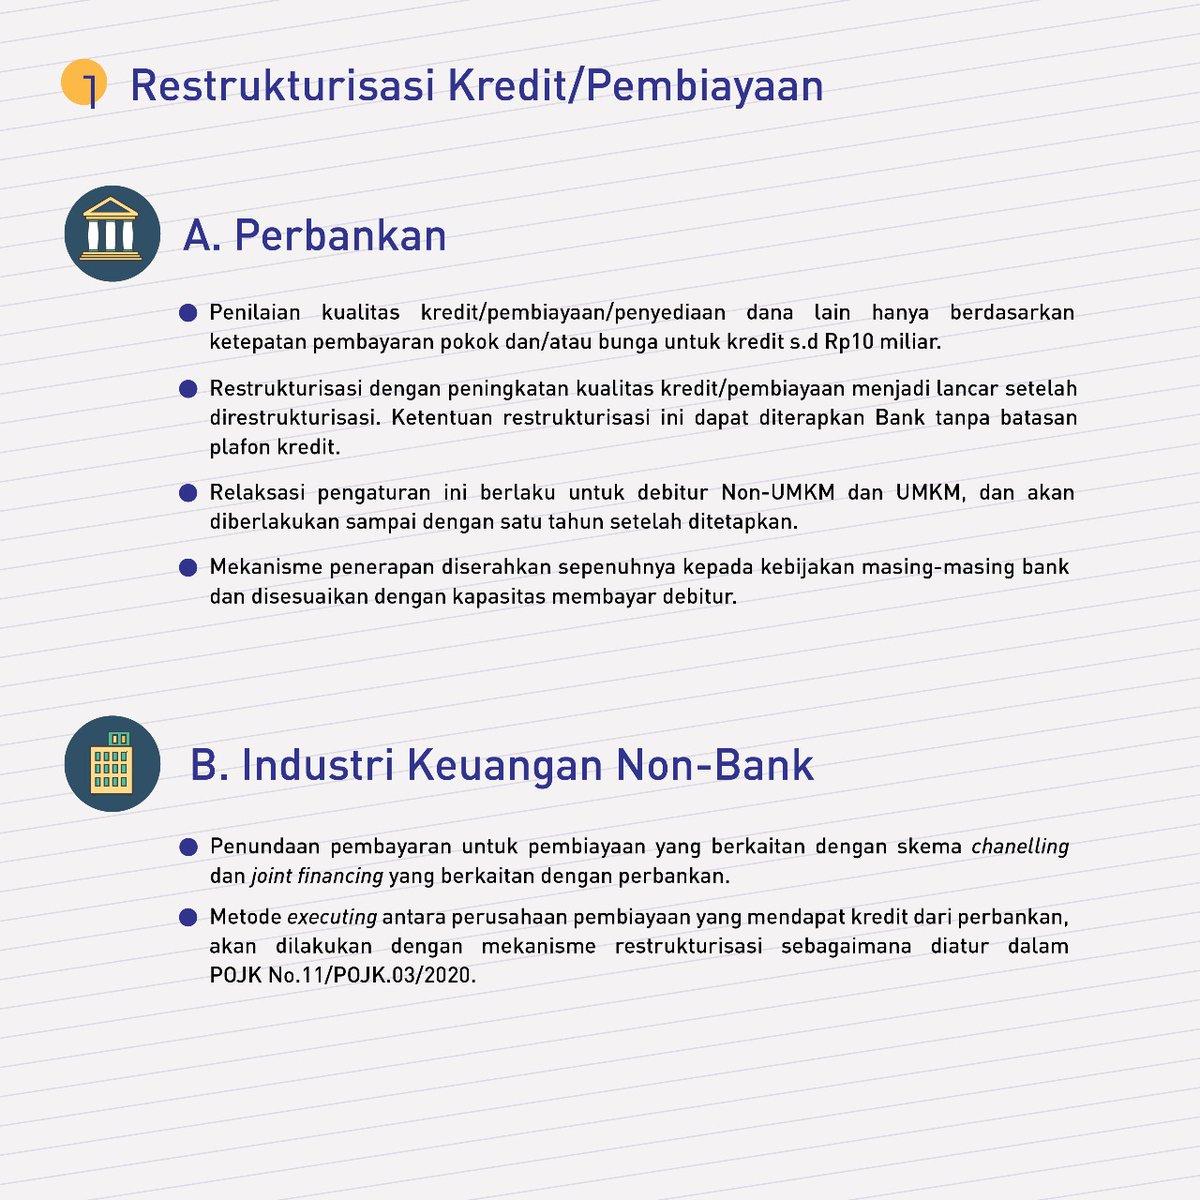 Ojk Indonesia On Twitter Sobat Ojk Sampai Dengan 20 Maret 2020 Berbagai Kebijakan Stimulus Telah Ojk Keluarkan Untuk Mengurangi Dampak Covid 19 Pada Sektor Jasa Keuangan Dan Masyarakat Info Selengkapnya Dapat Disimak Pada